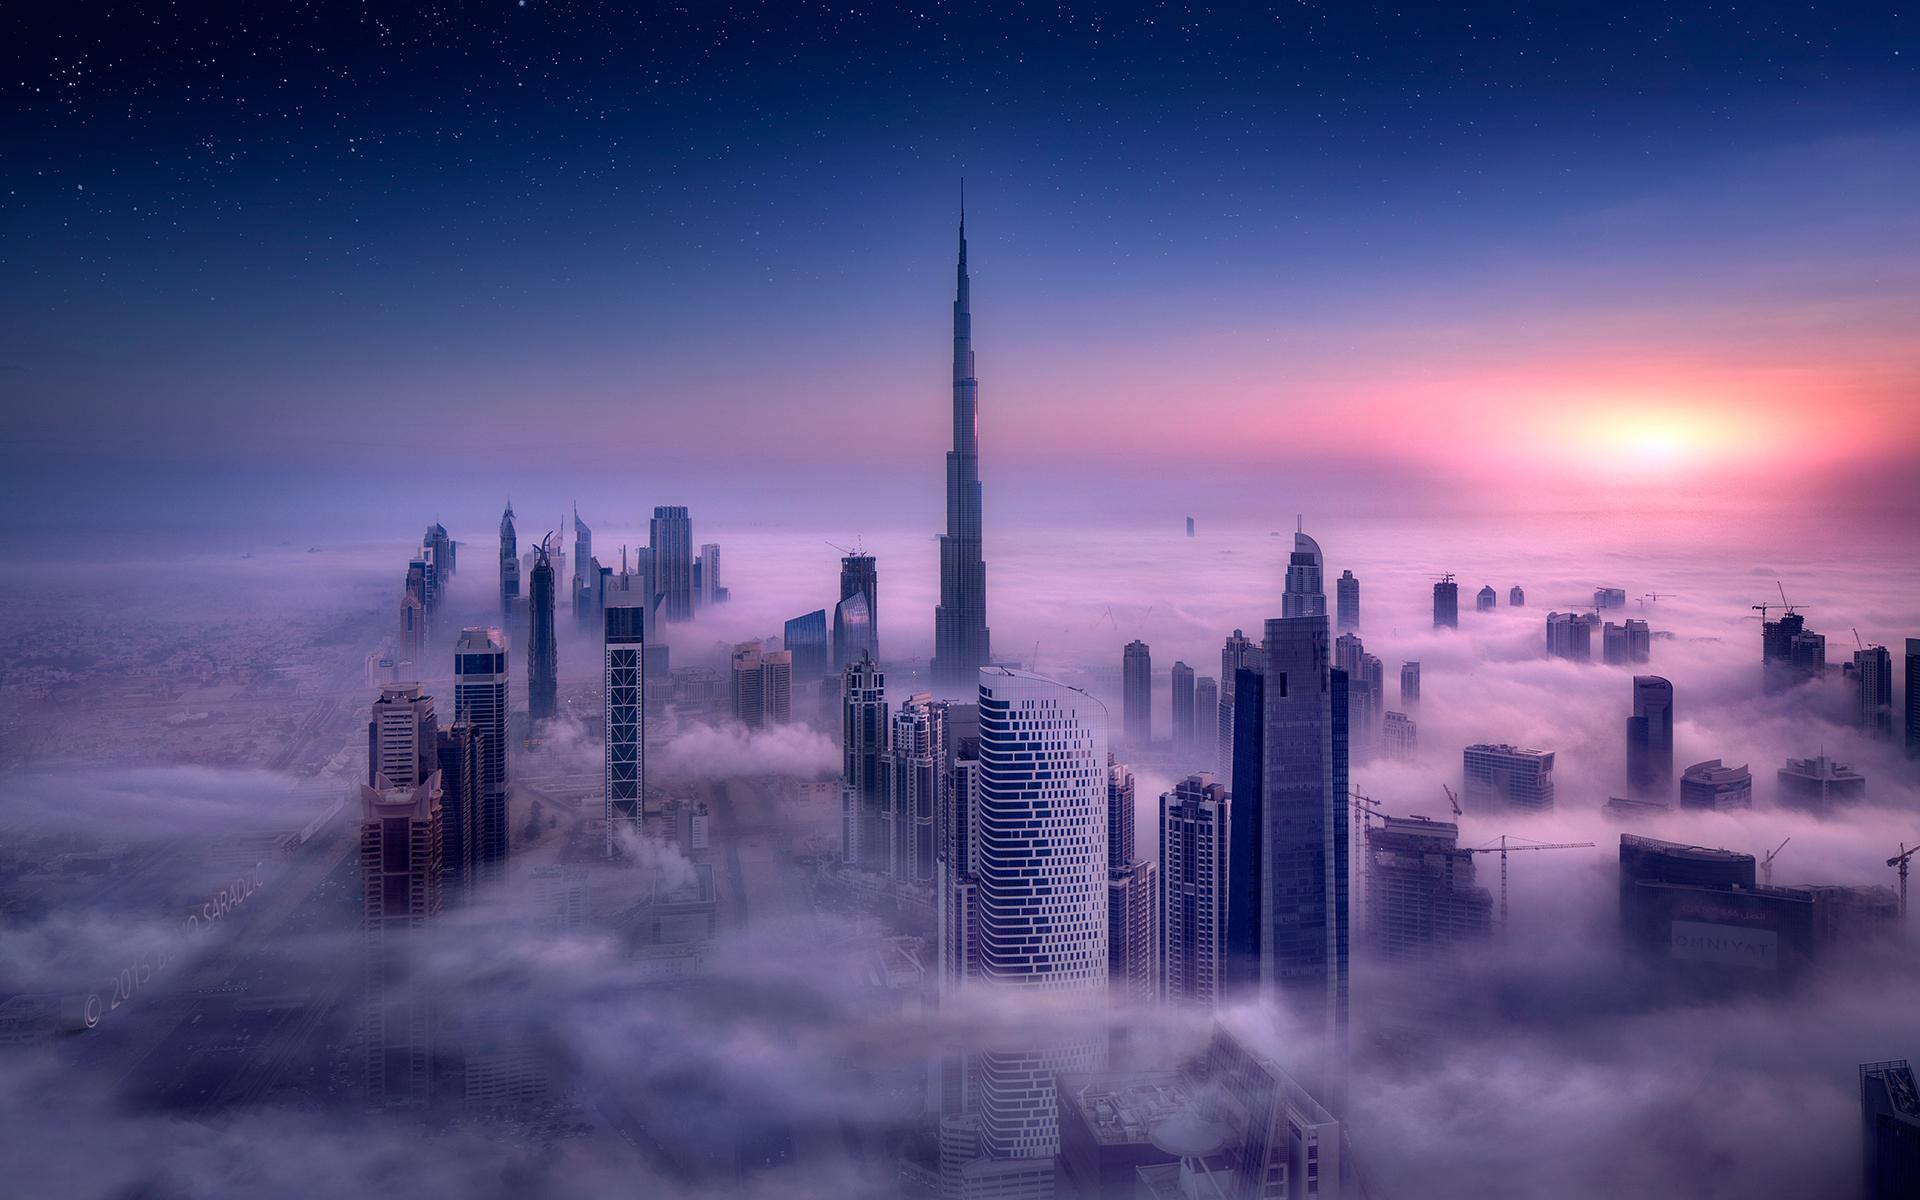 Sky City Clouds Skyscraper Cityscape Long Exposure